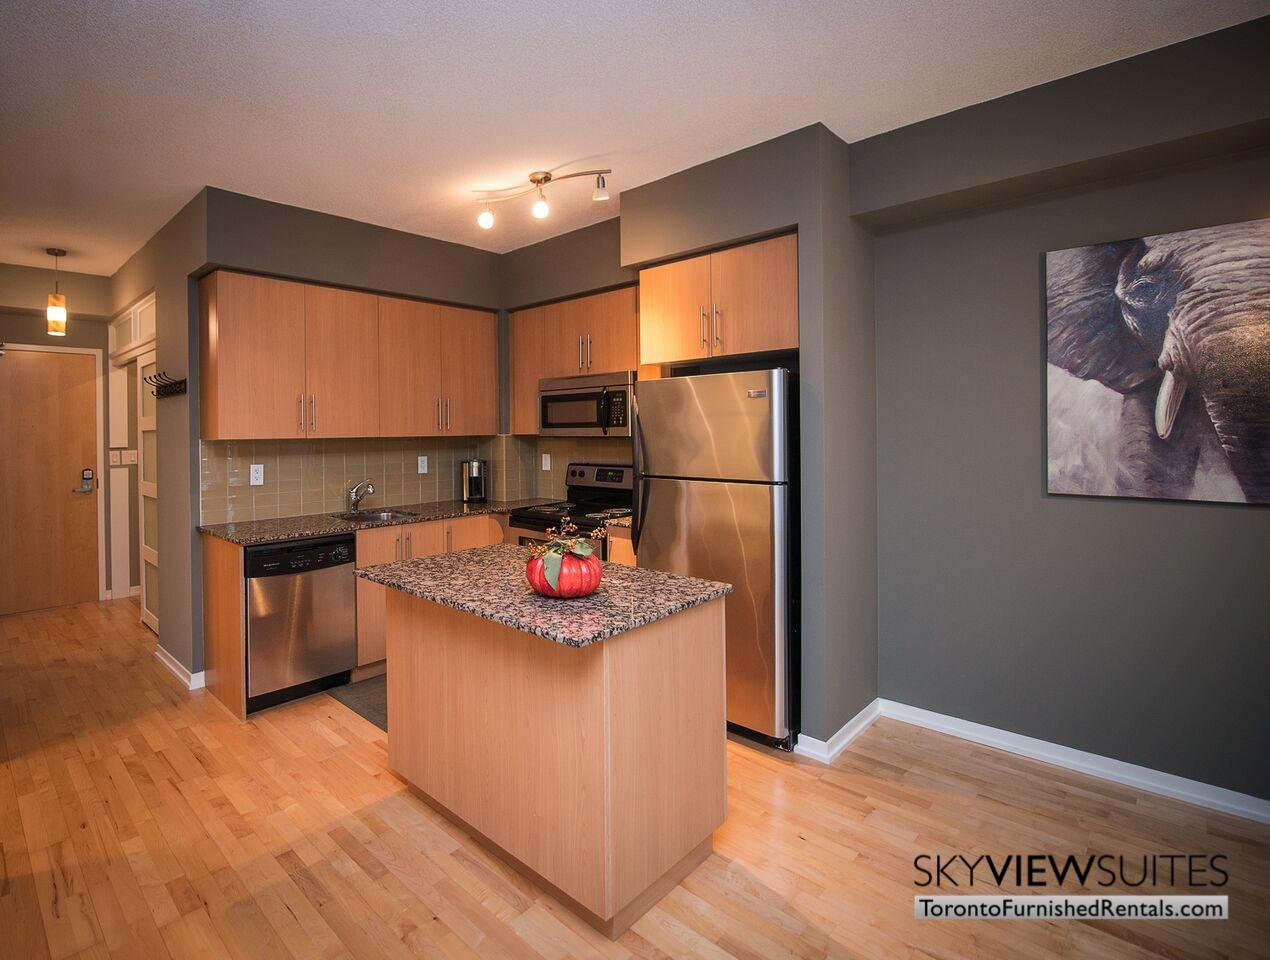 MLS furnished condo toronto kitchen